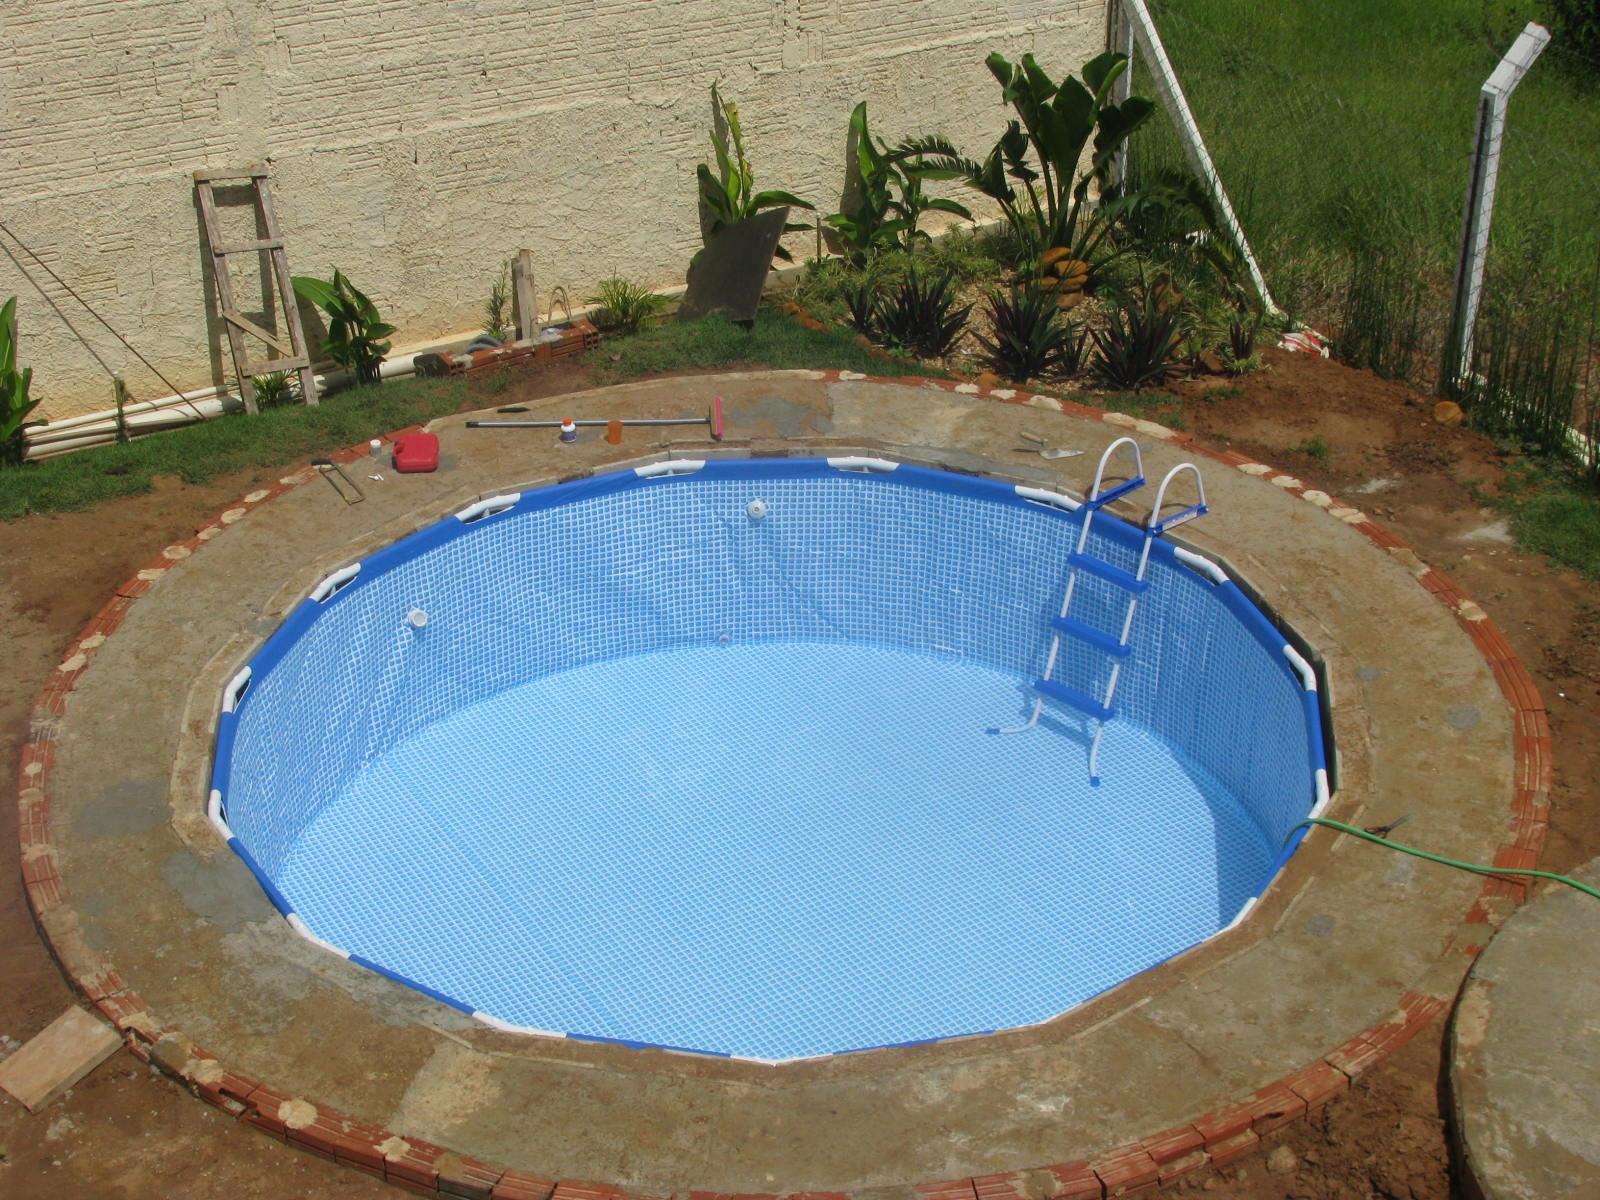 Montar piscina de pallet design de imagem - Piscinas de montar ...